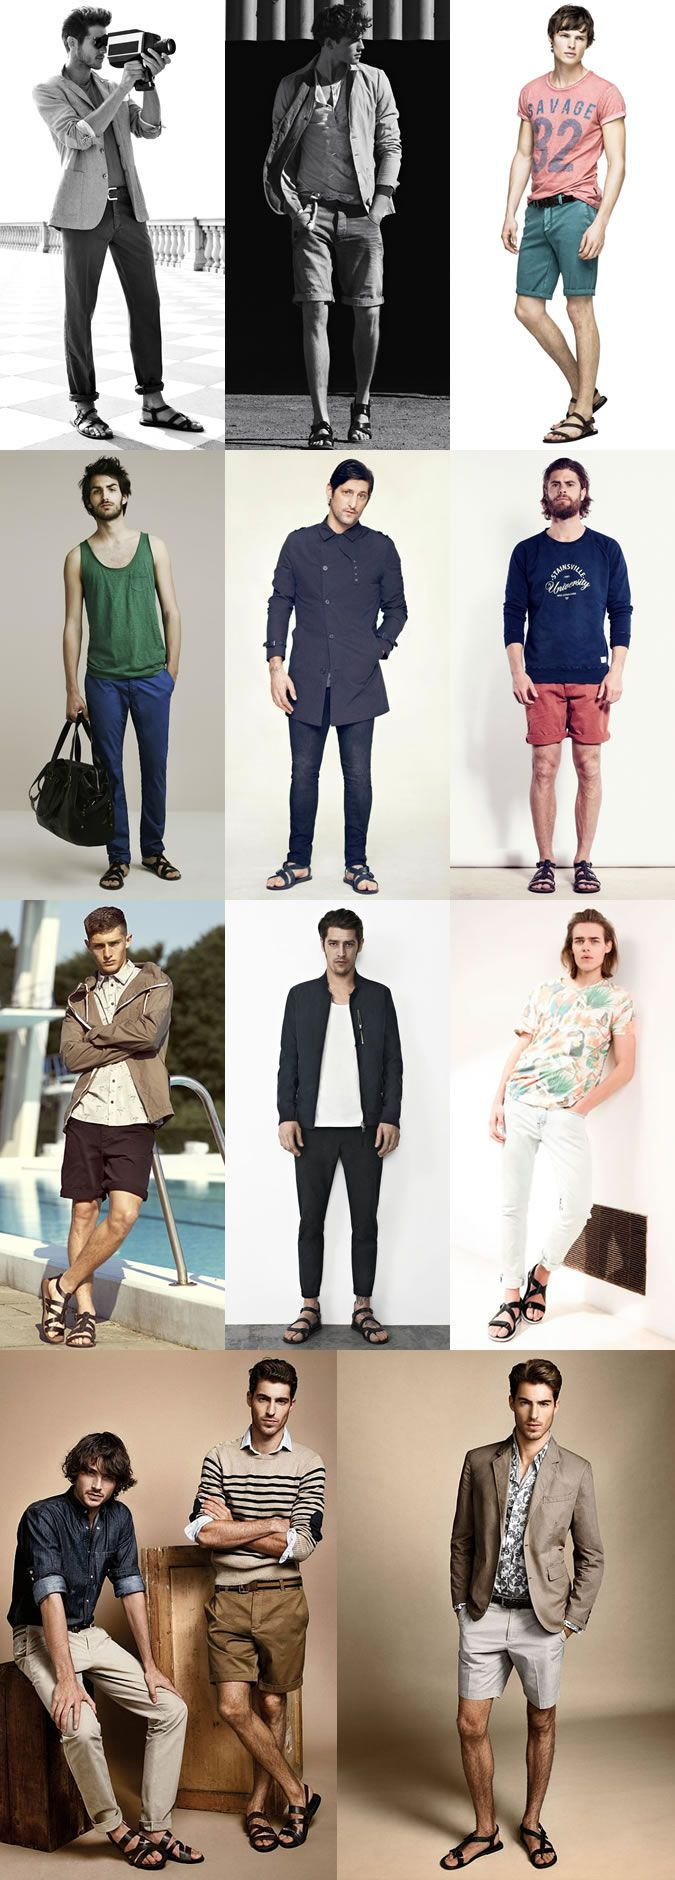 Men's 2014 Spring/Summer Footwear Trend: Sandals - The Gladiator Lookbook Inspiration